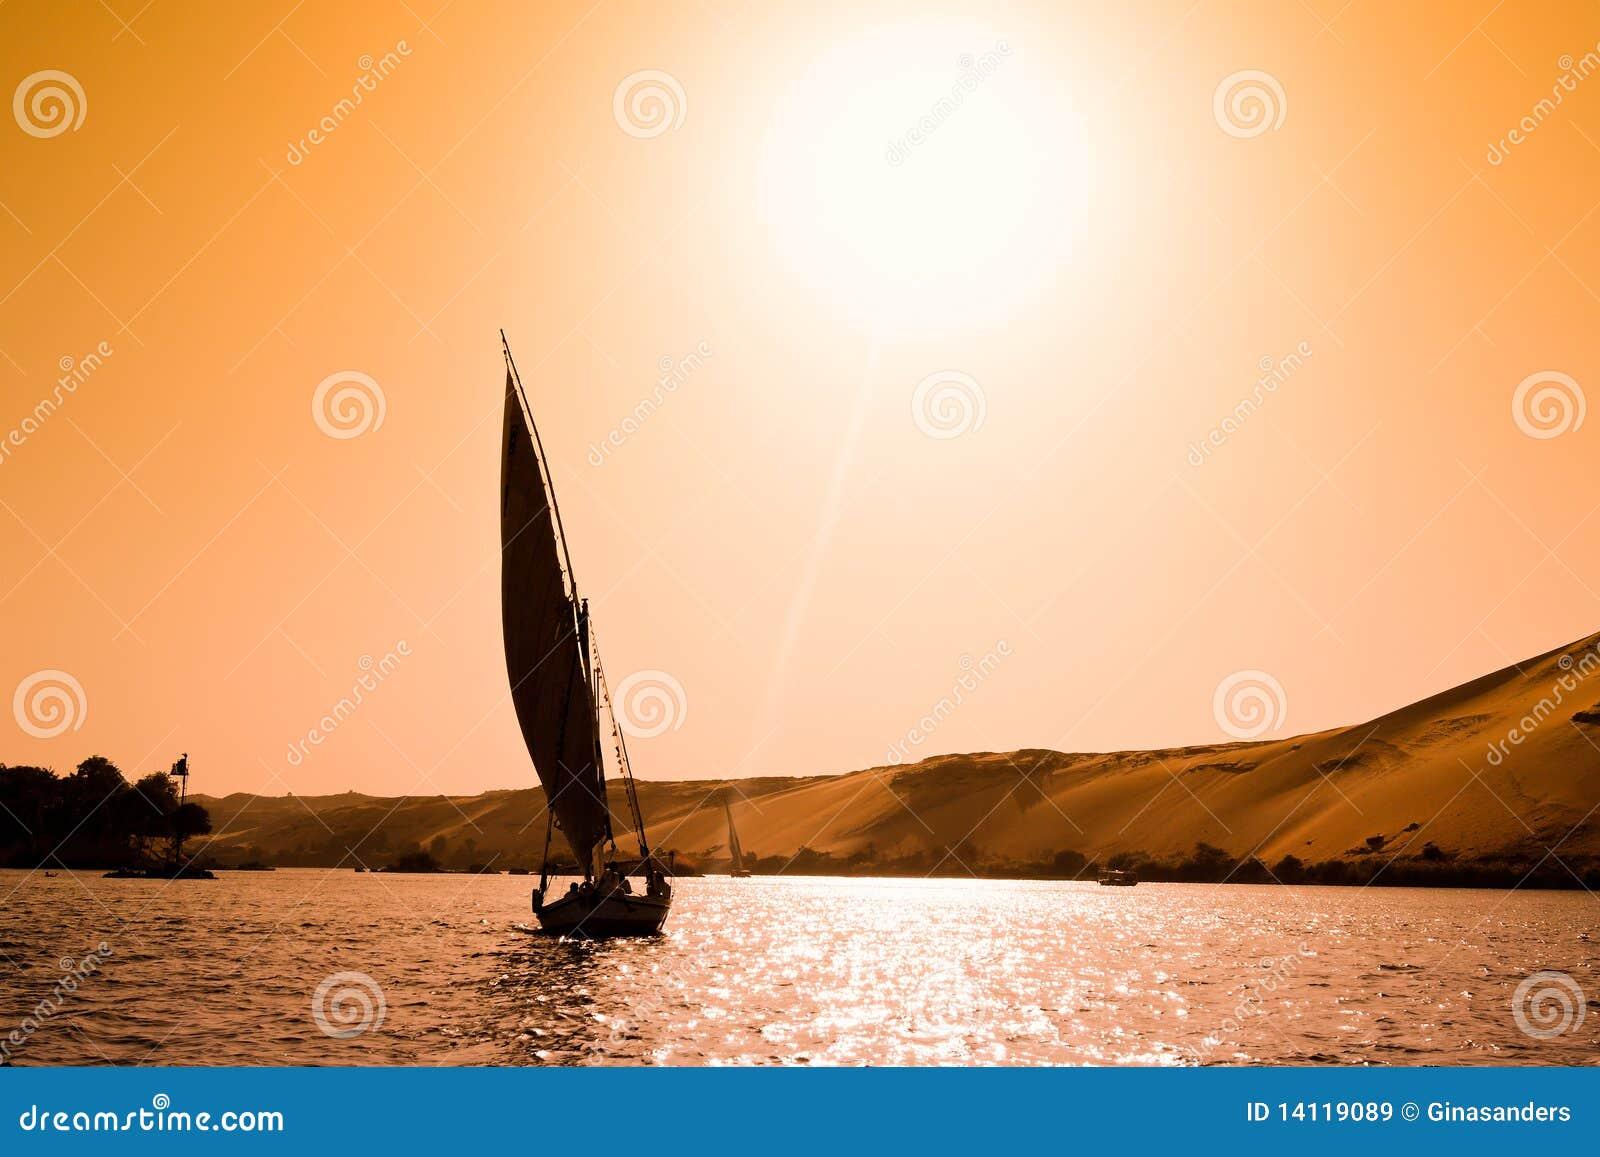 Aswan egypt felucca